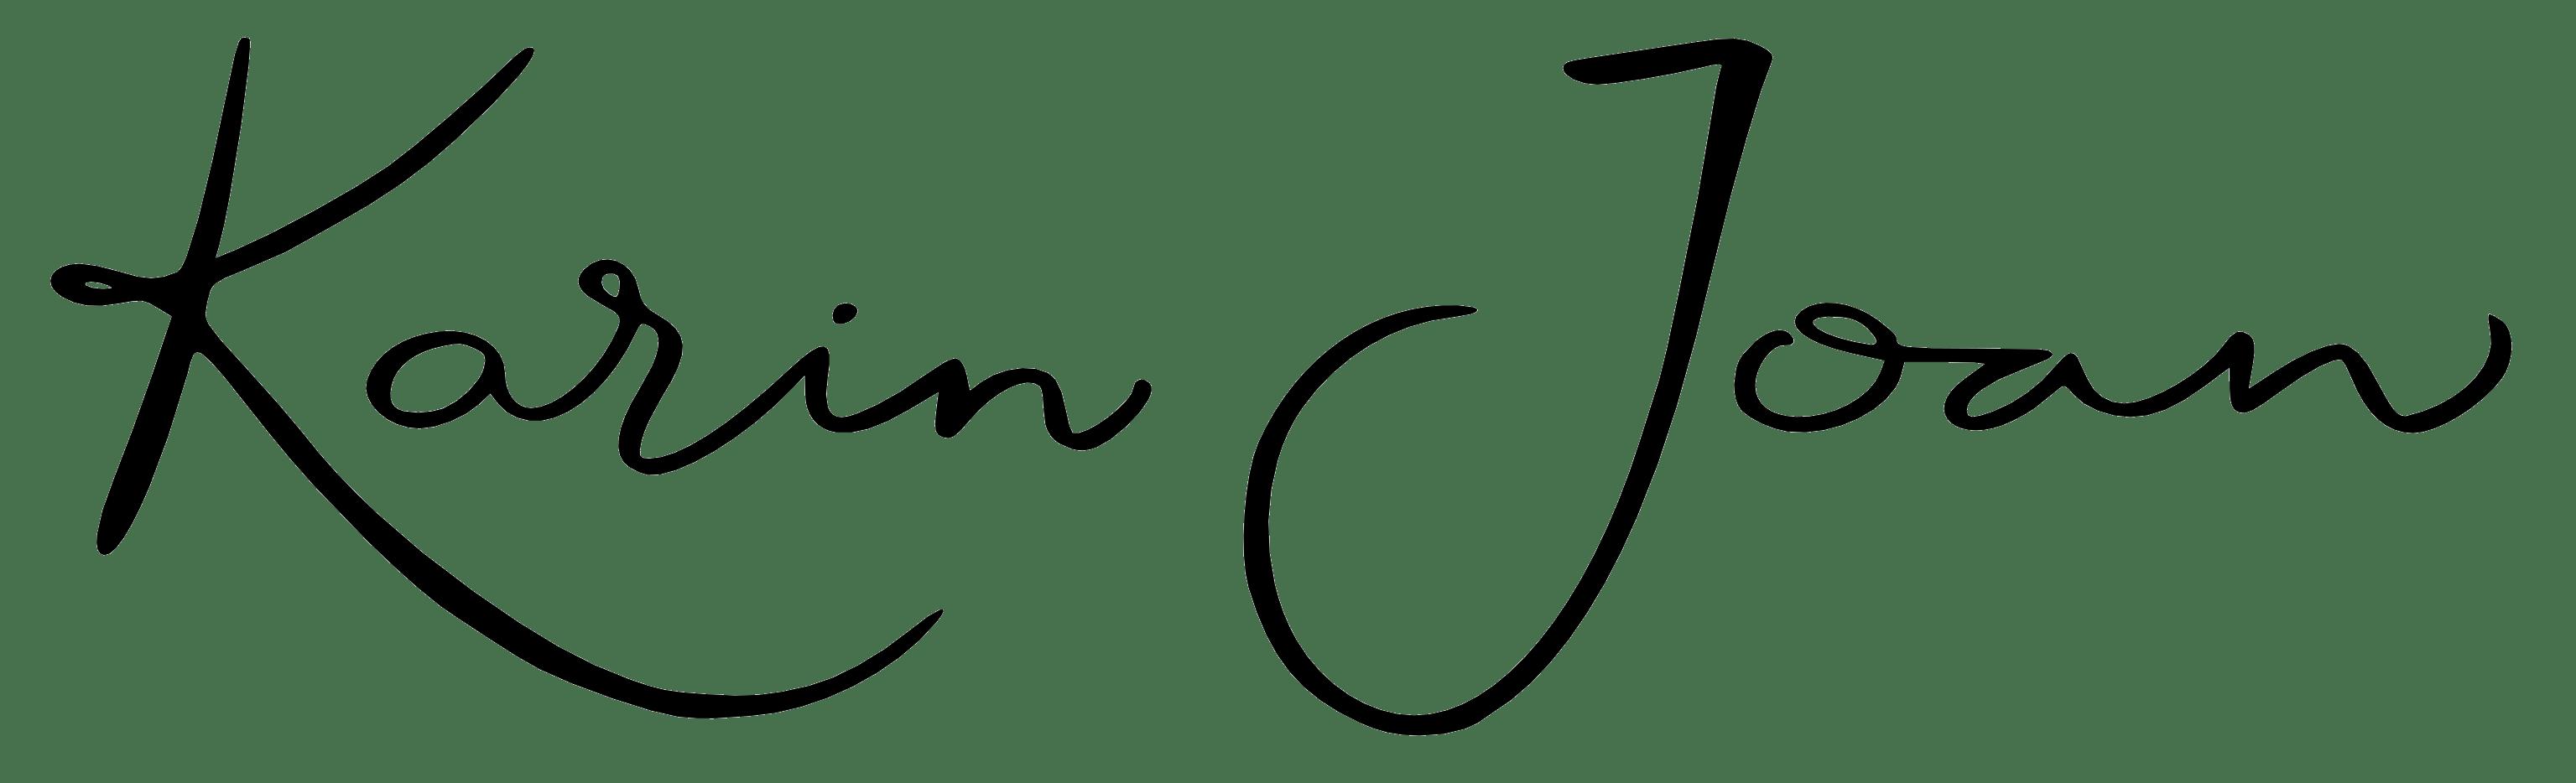 Mism-KJ logo juni 2018 2 kopie